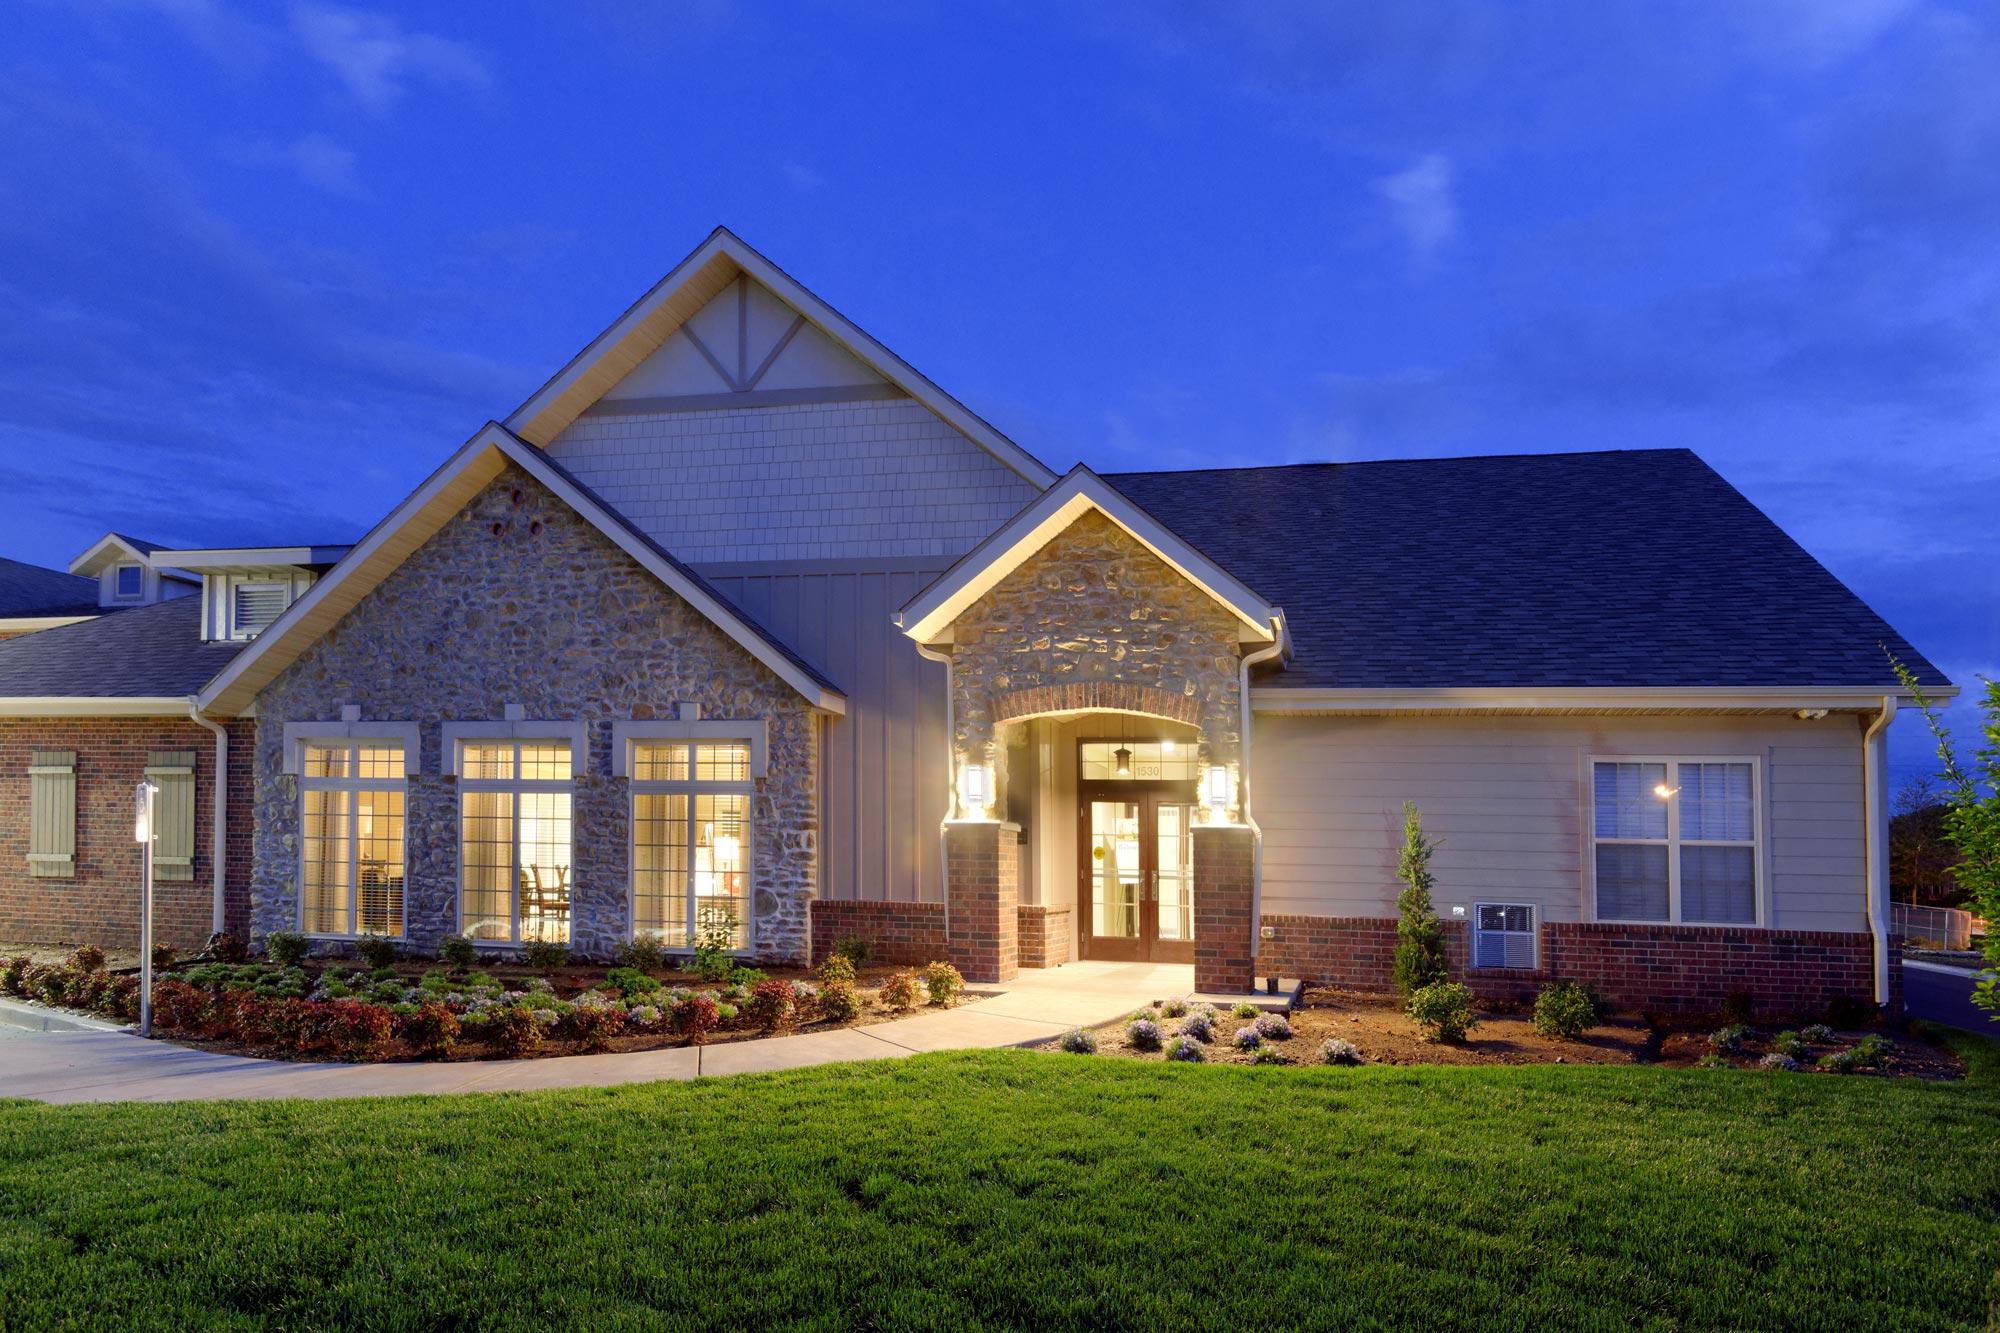 Castlewood-Senior-Living-H-Design-Exterior-01.jpg